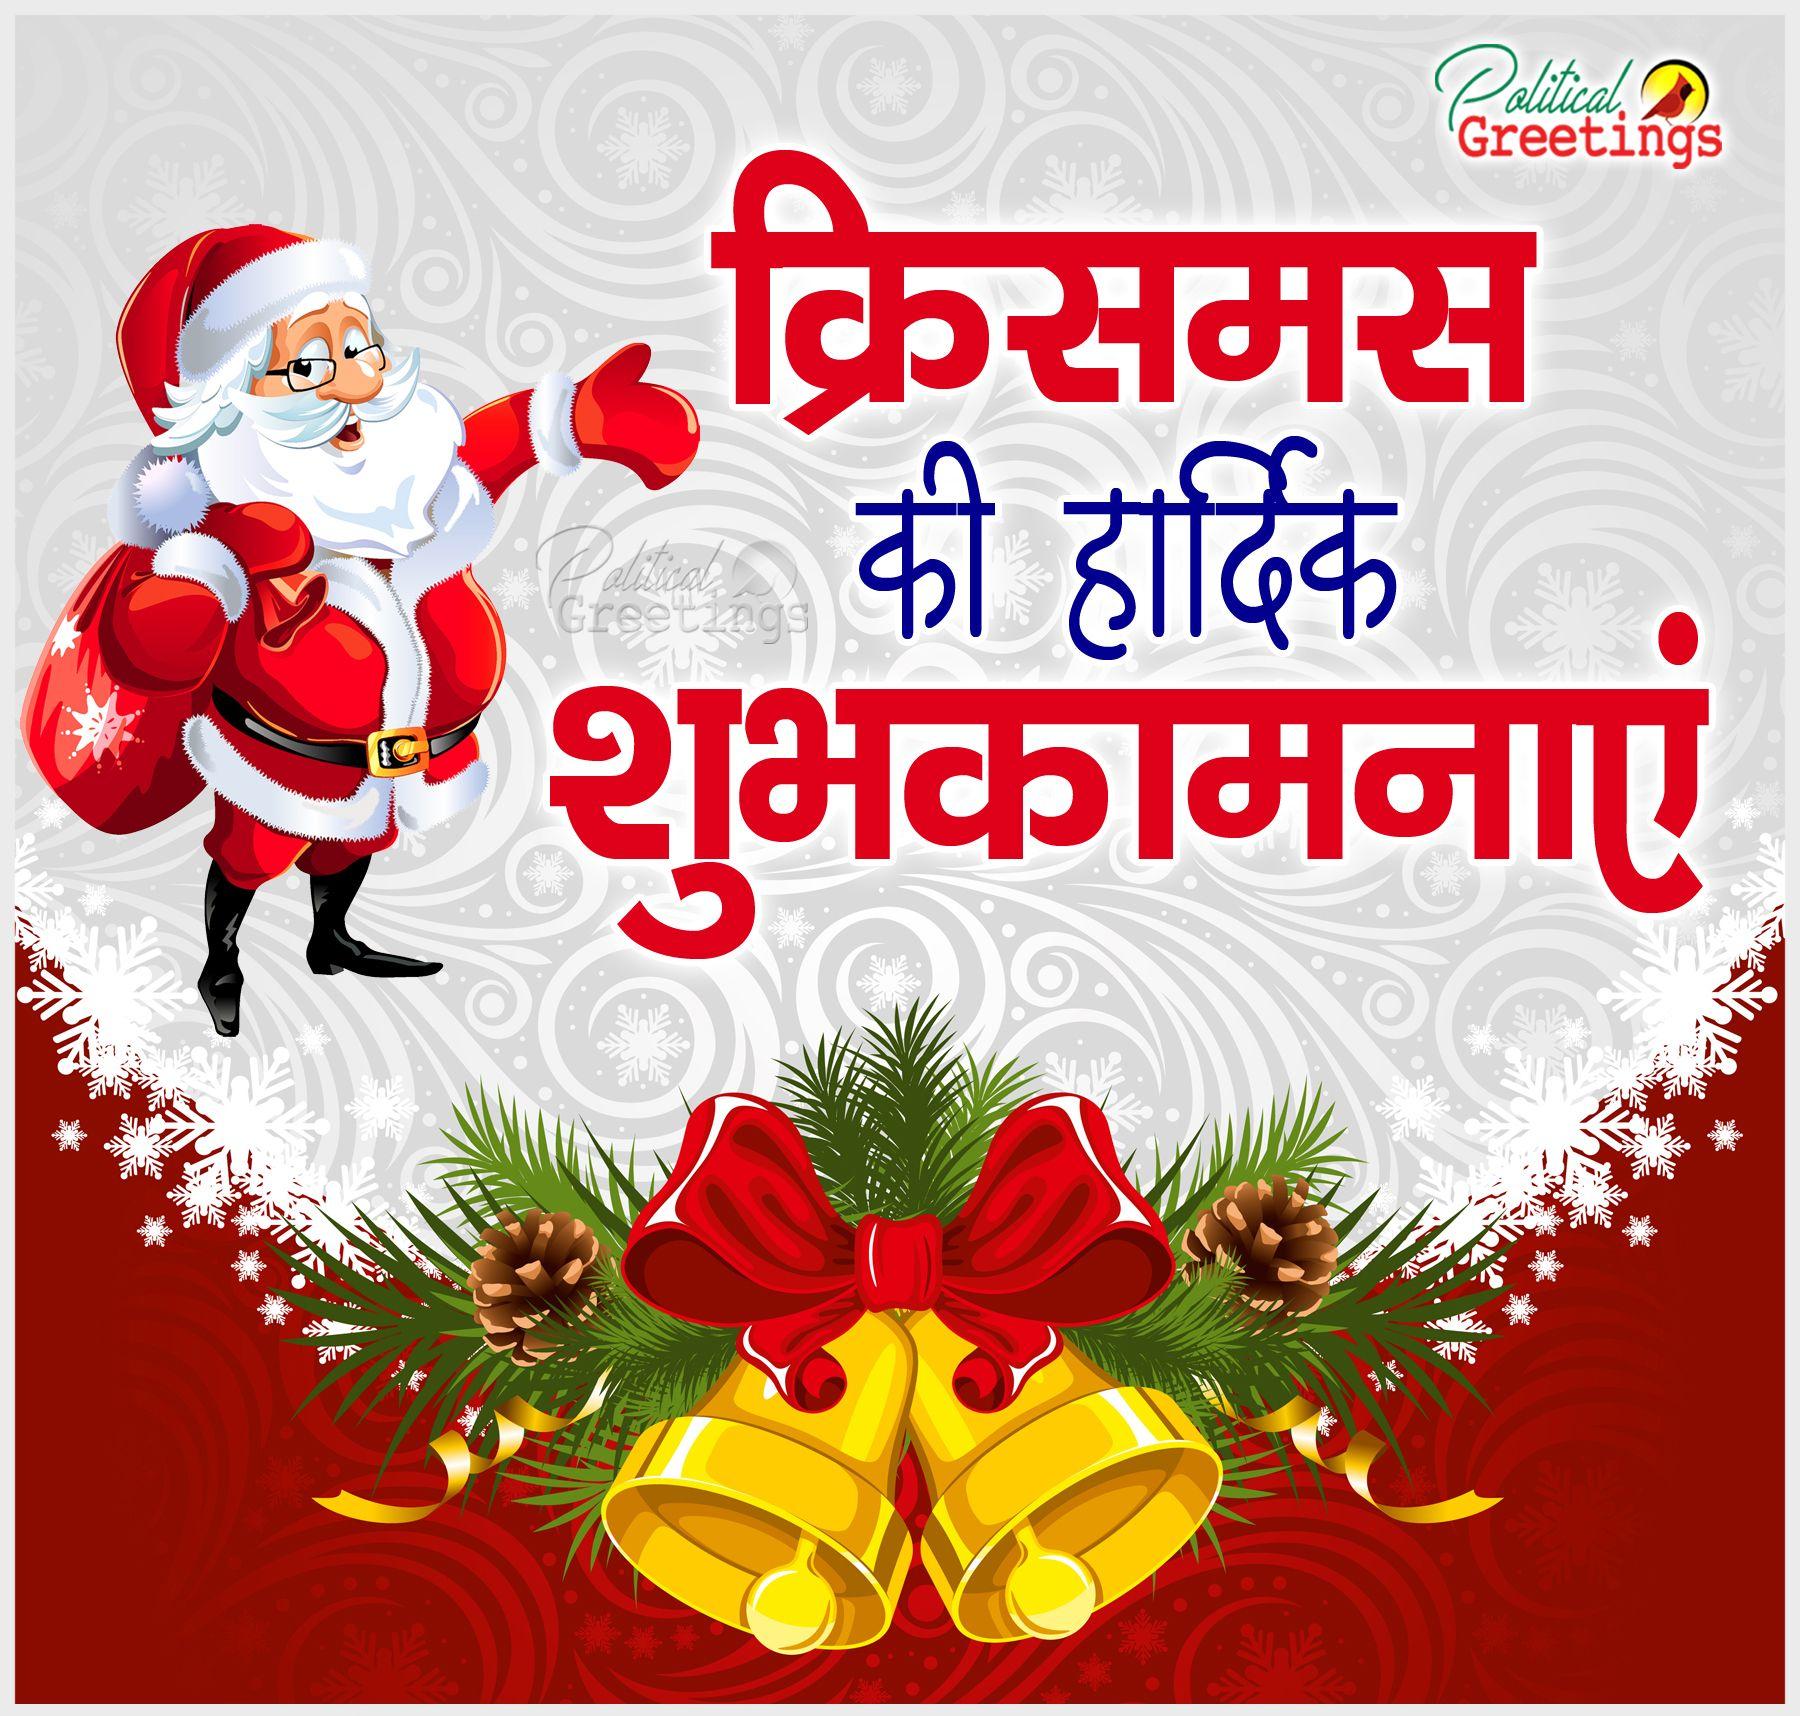 Happy christmas shayari quotes and greetings in hindi happy happy christmas shayari quotes and greetings in hindi happy christmas status in hindihappy christmas hindi quotes hq images for facebookbest christmas m4hsunfo